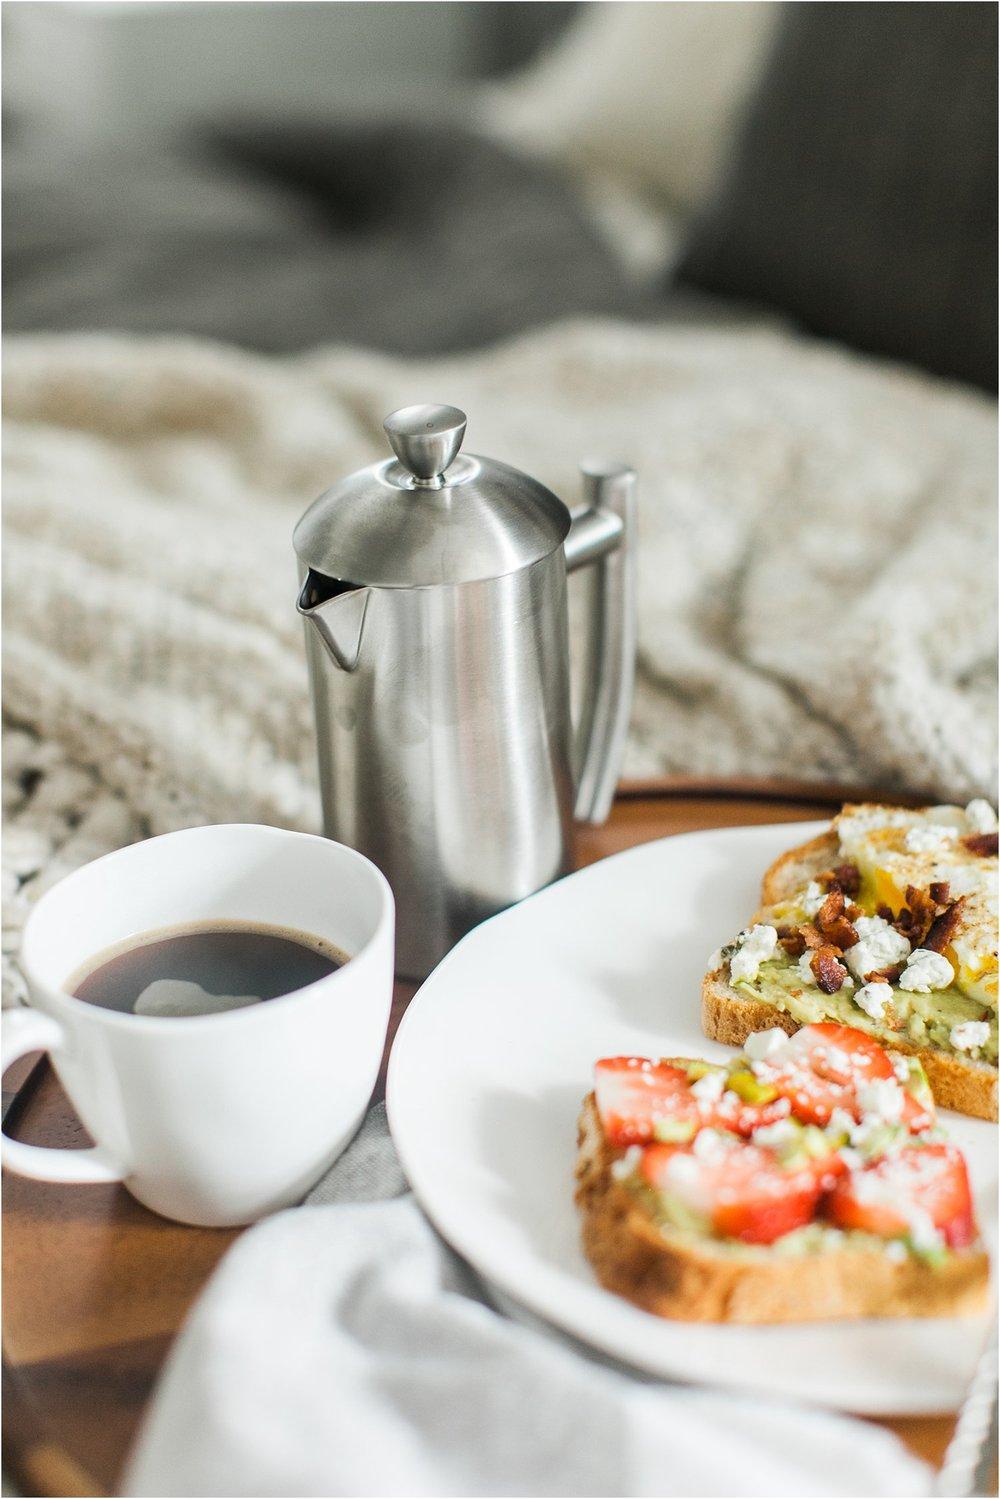 Breakfast in Bed | Avocado Toast Two Ways